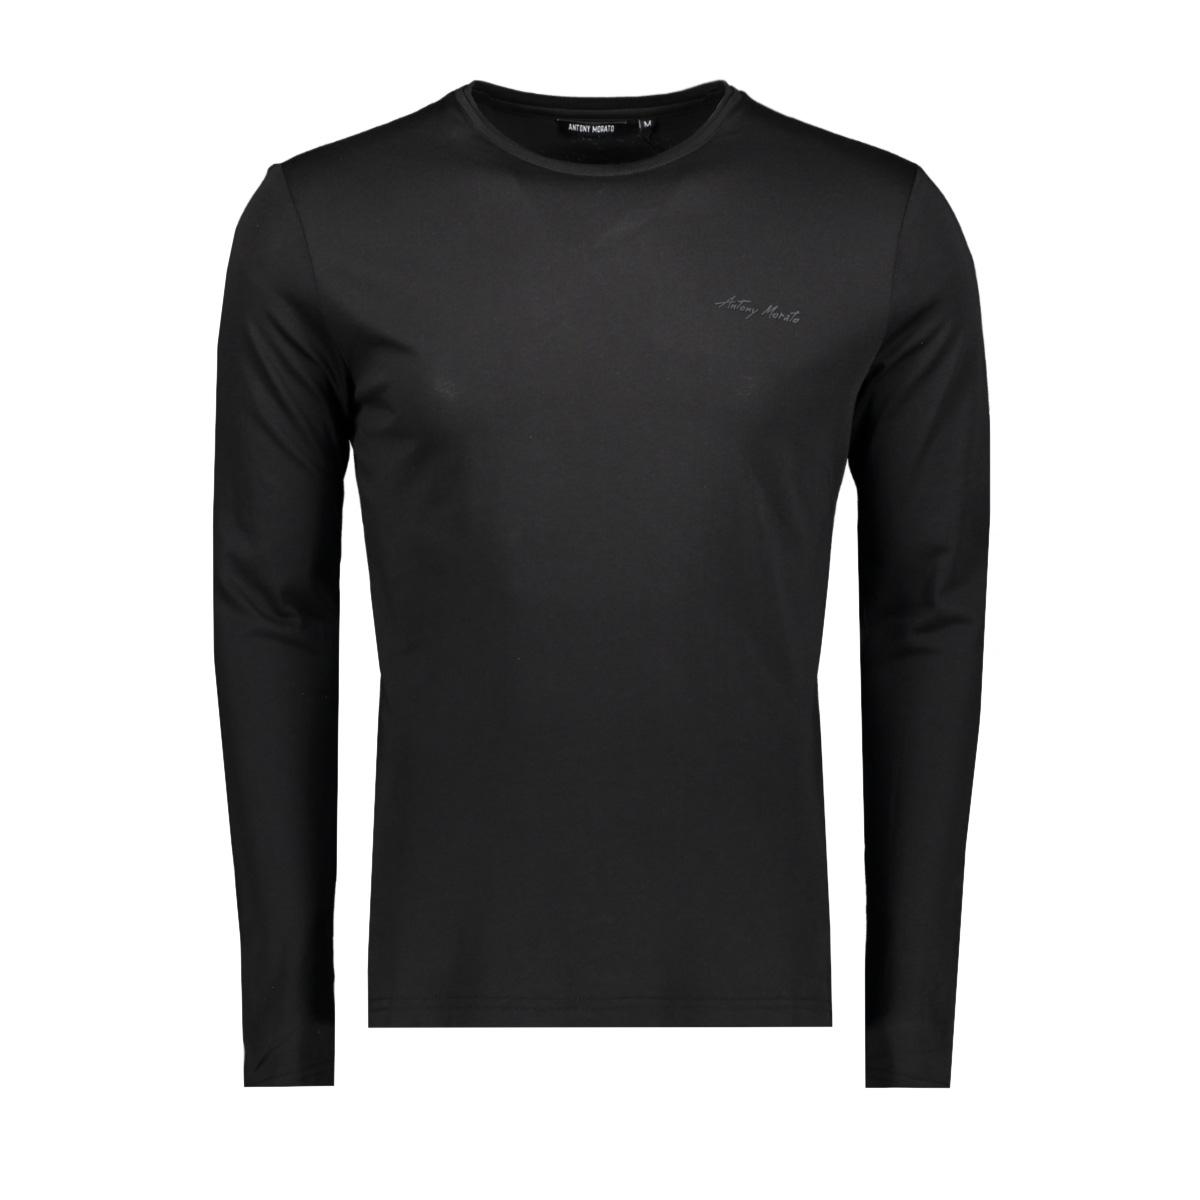 knitwear mmkl00279 antony morato t-shirt 9000 black